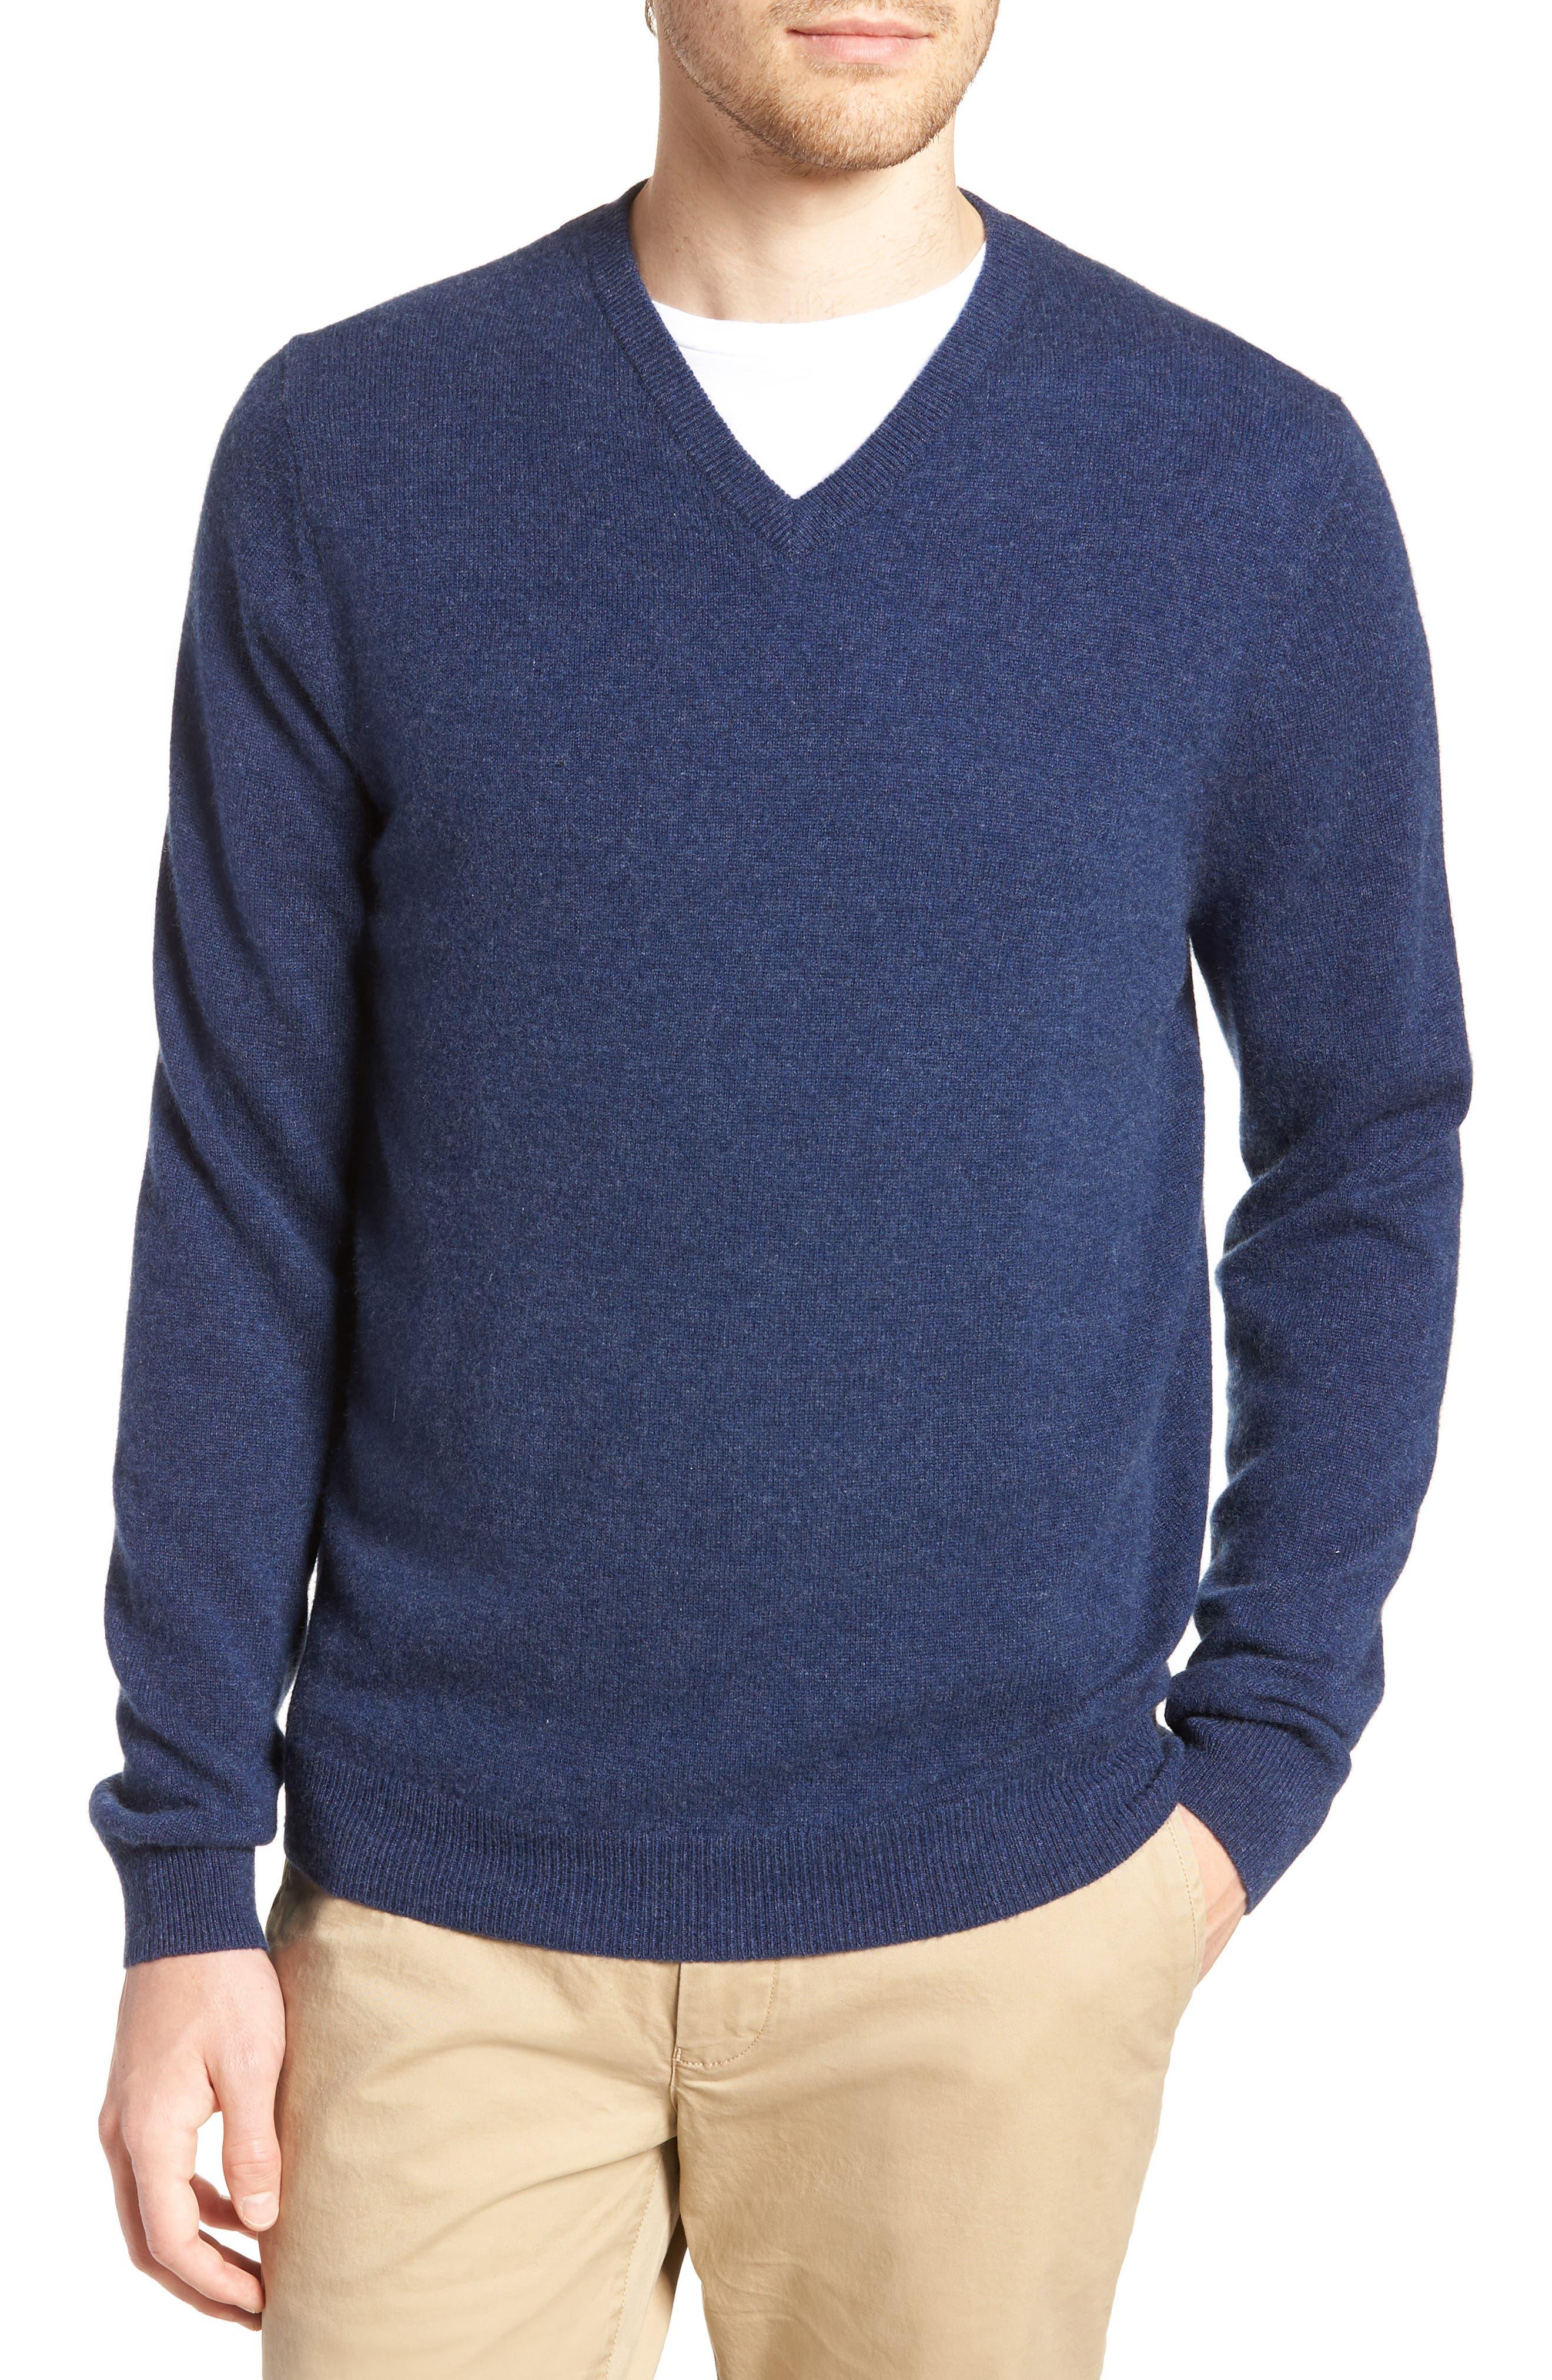 Cashmere V-Neck Sweater,                         Main,                         color, BLUE ESTATE HEATHER